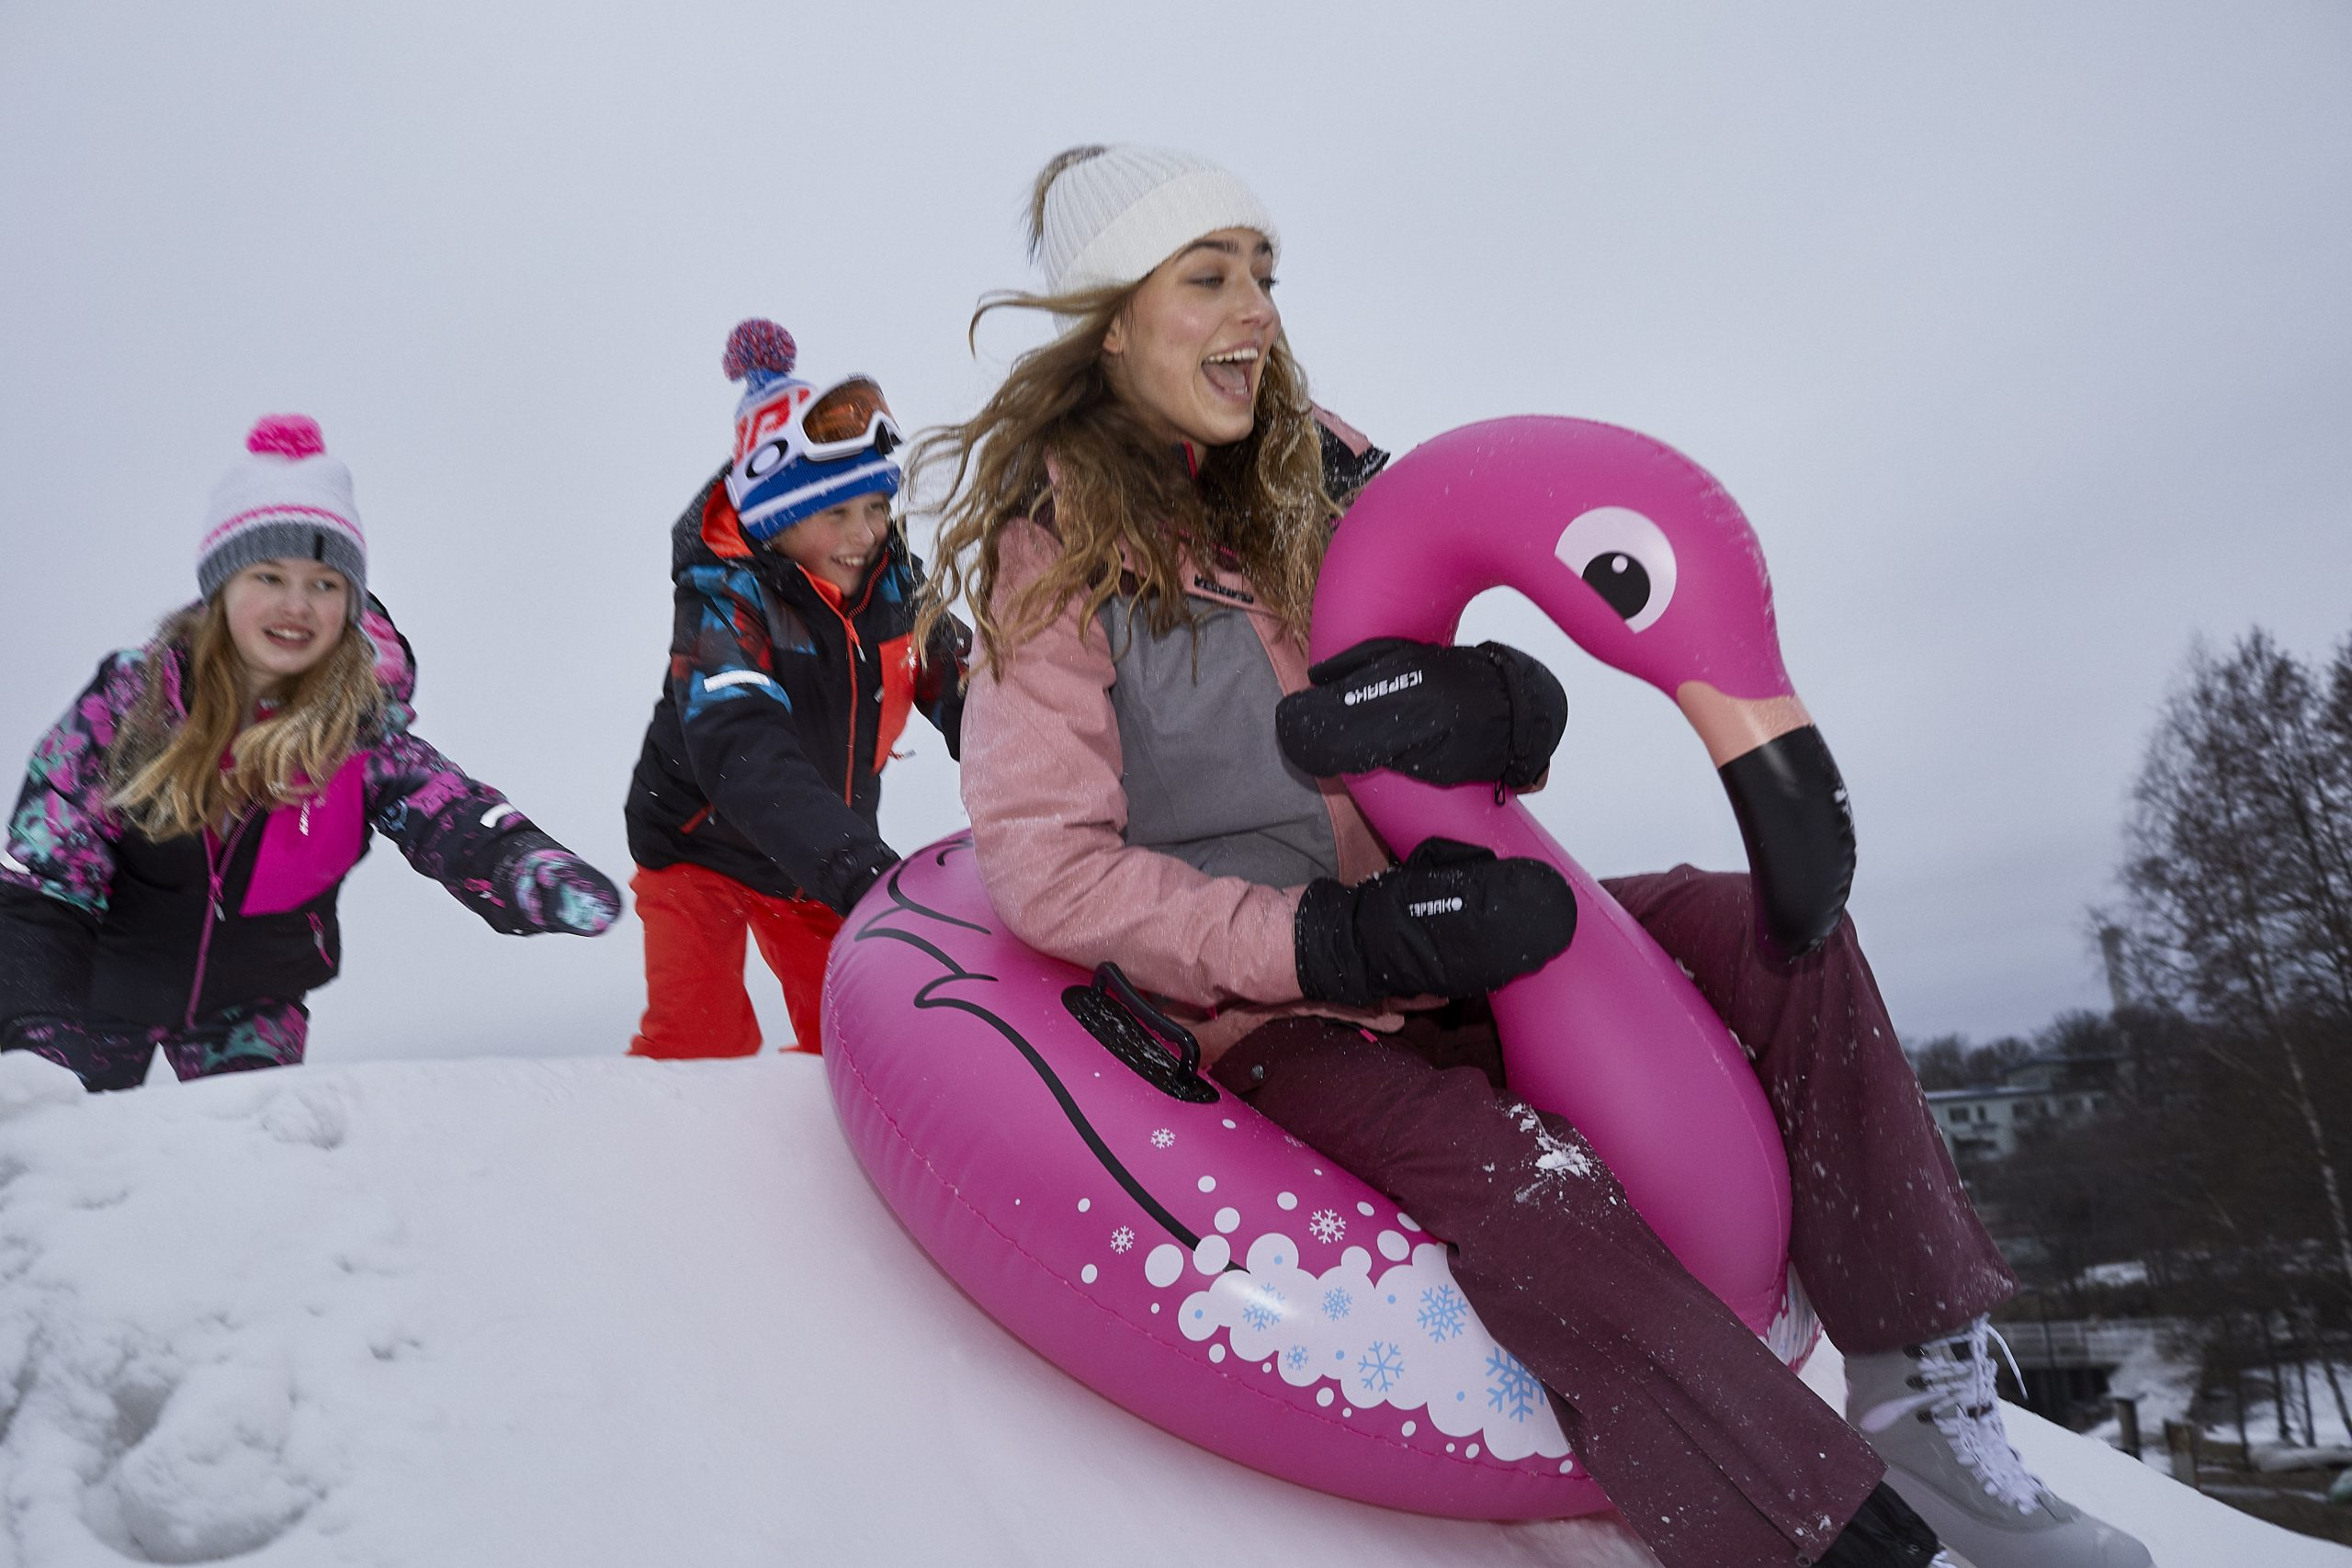 Outlet Center Salzburg Skikleidung